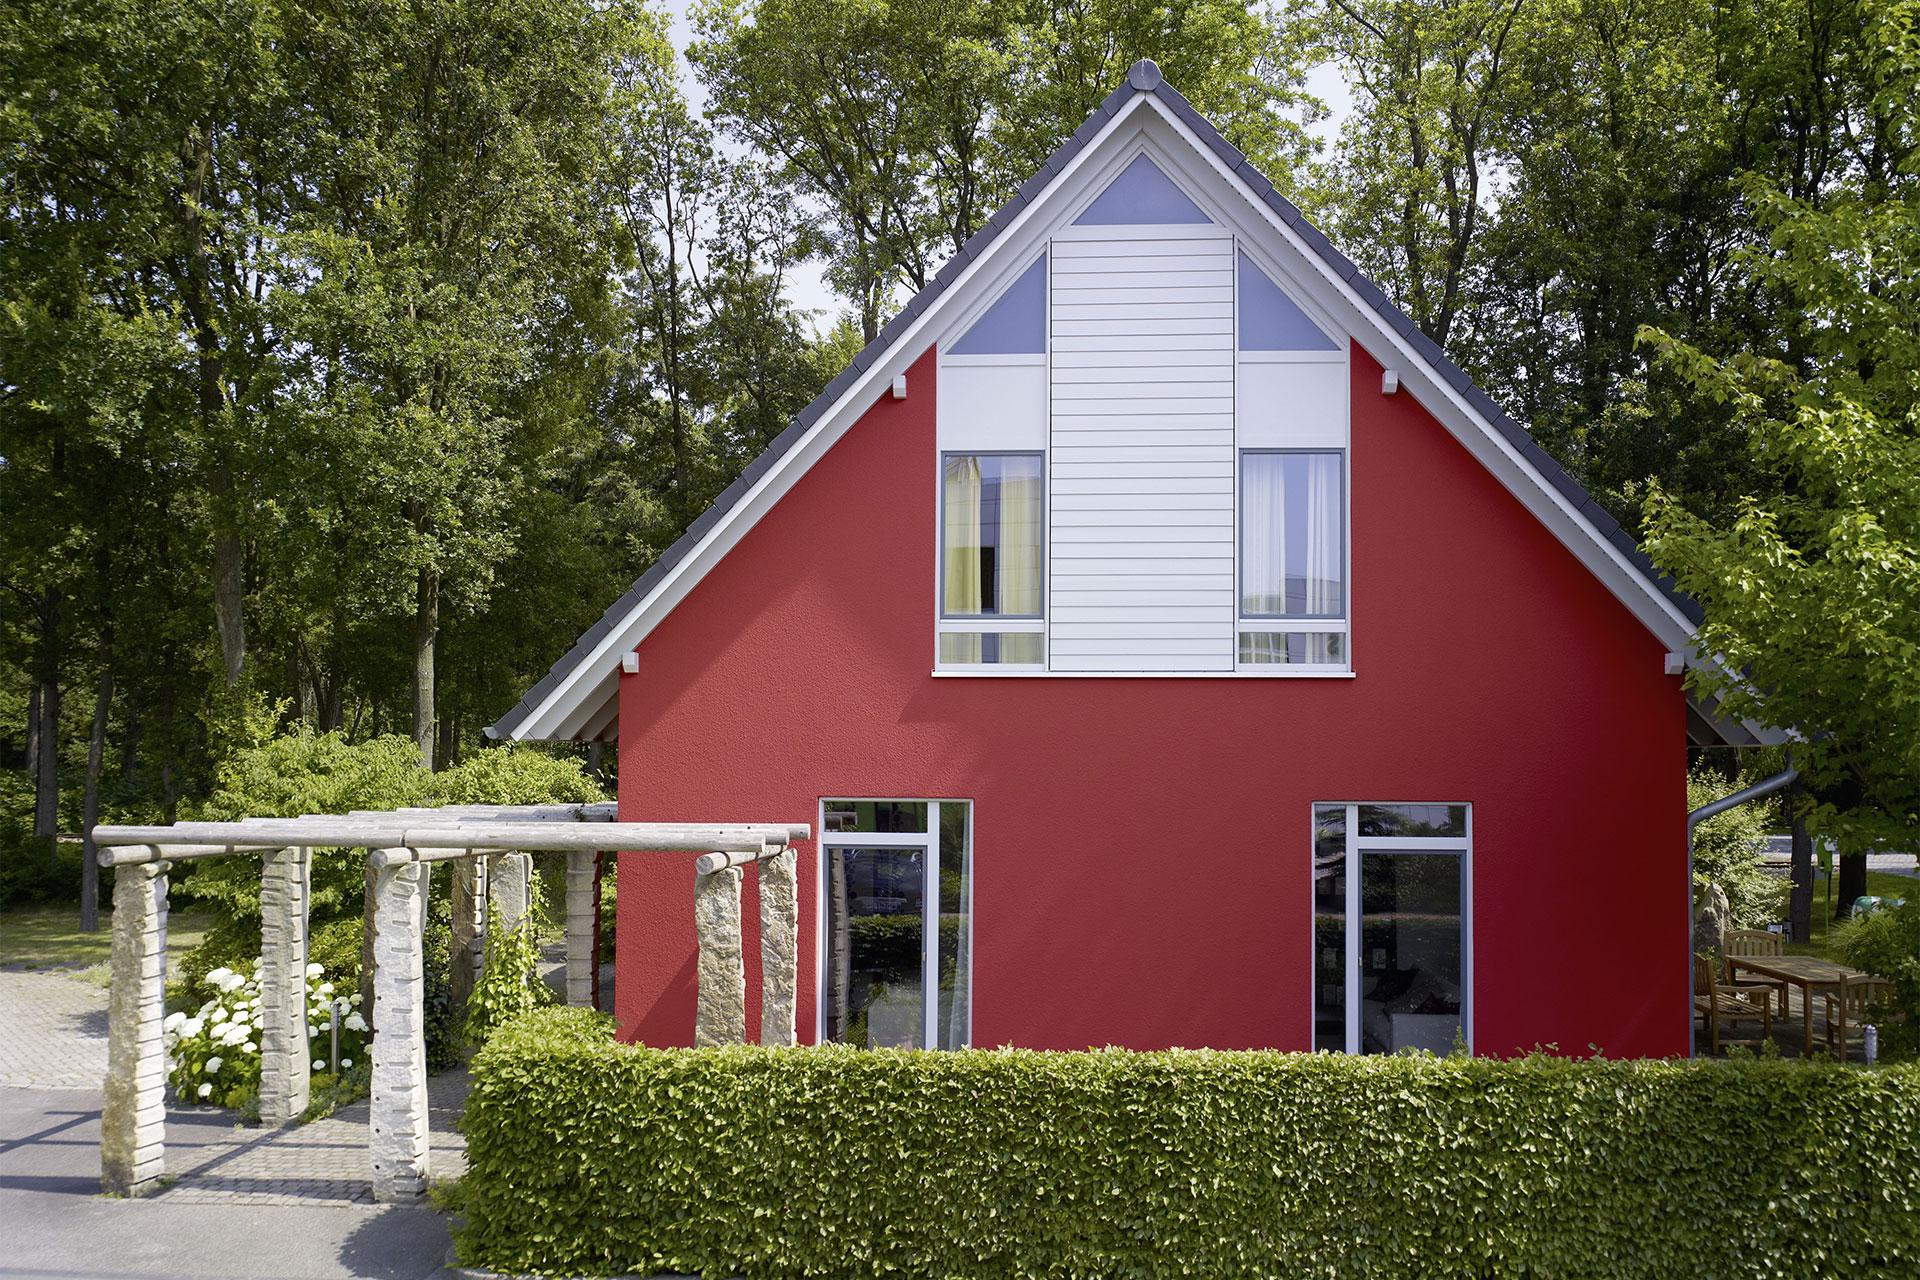 musterhaus svenja nordhorn ein fertighaus von gussek haus. Black Bedroom Furniture Sets. Home Design Ideas